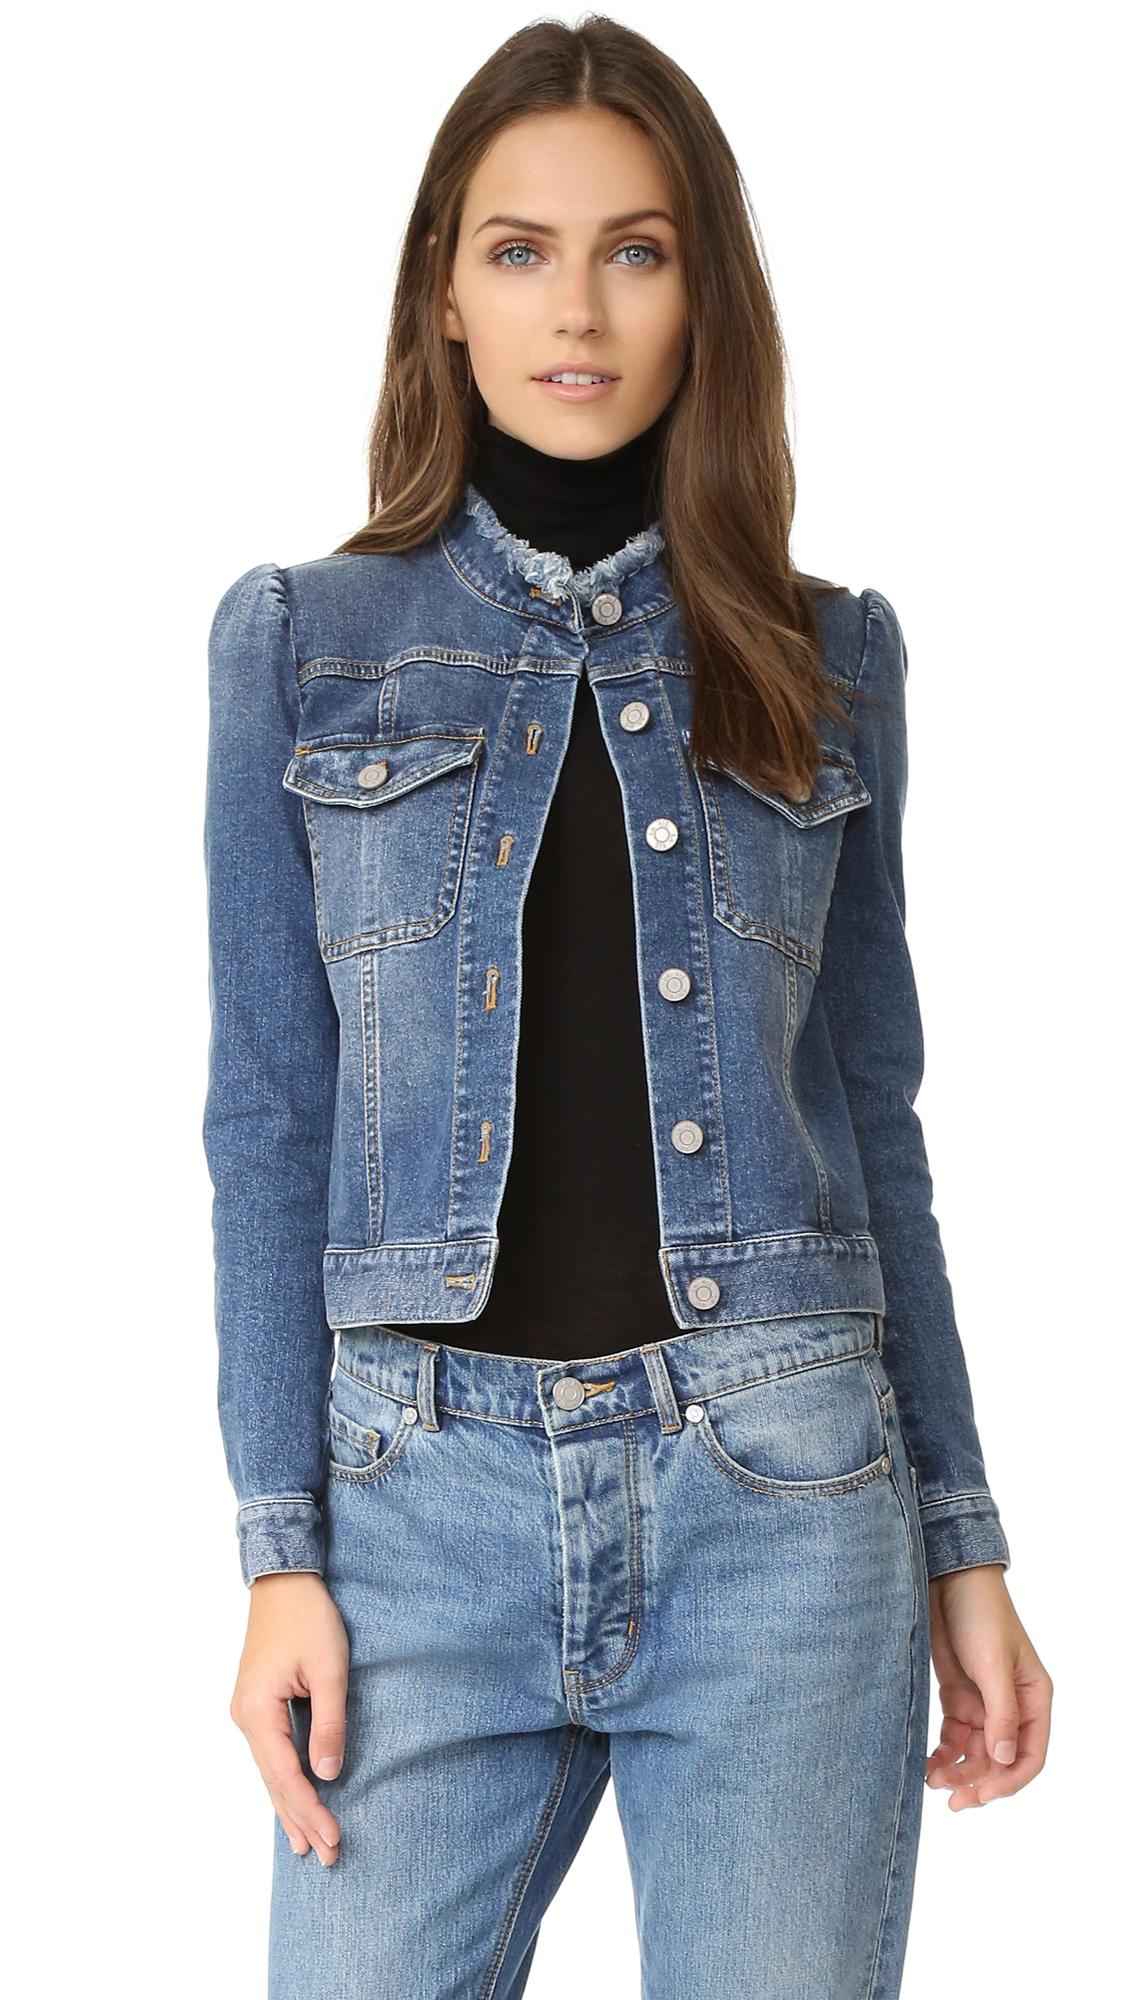 La Vie Rebecca Taylor Stretch Denim Jacket - Saltwater Wash at Shopbop